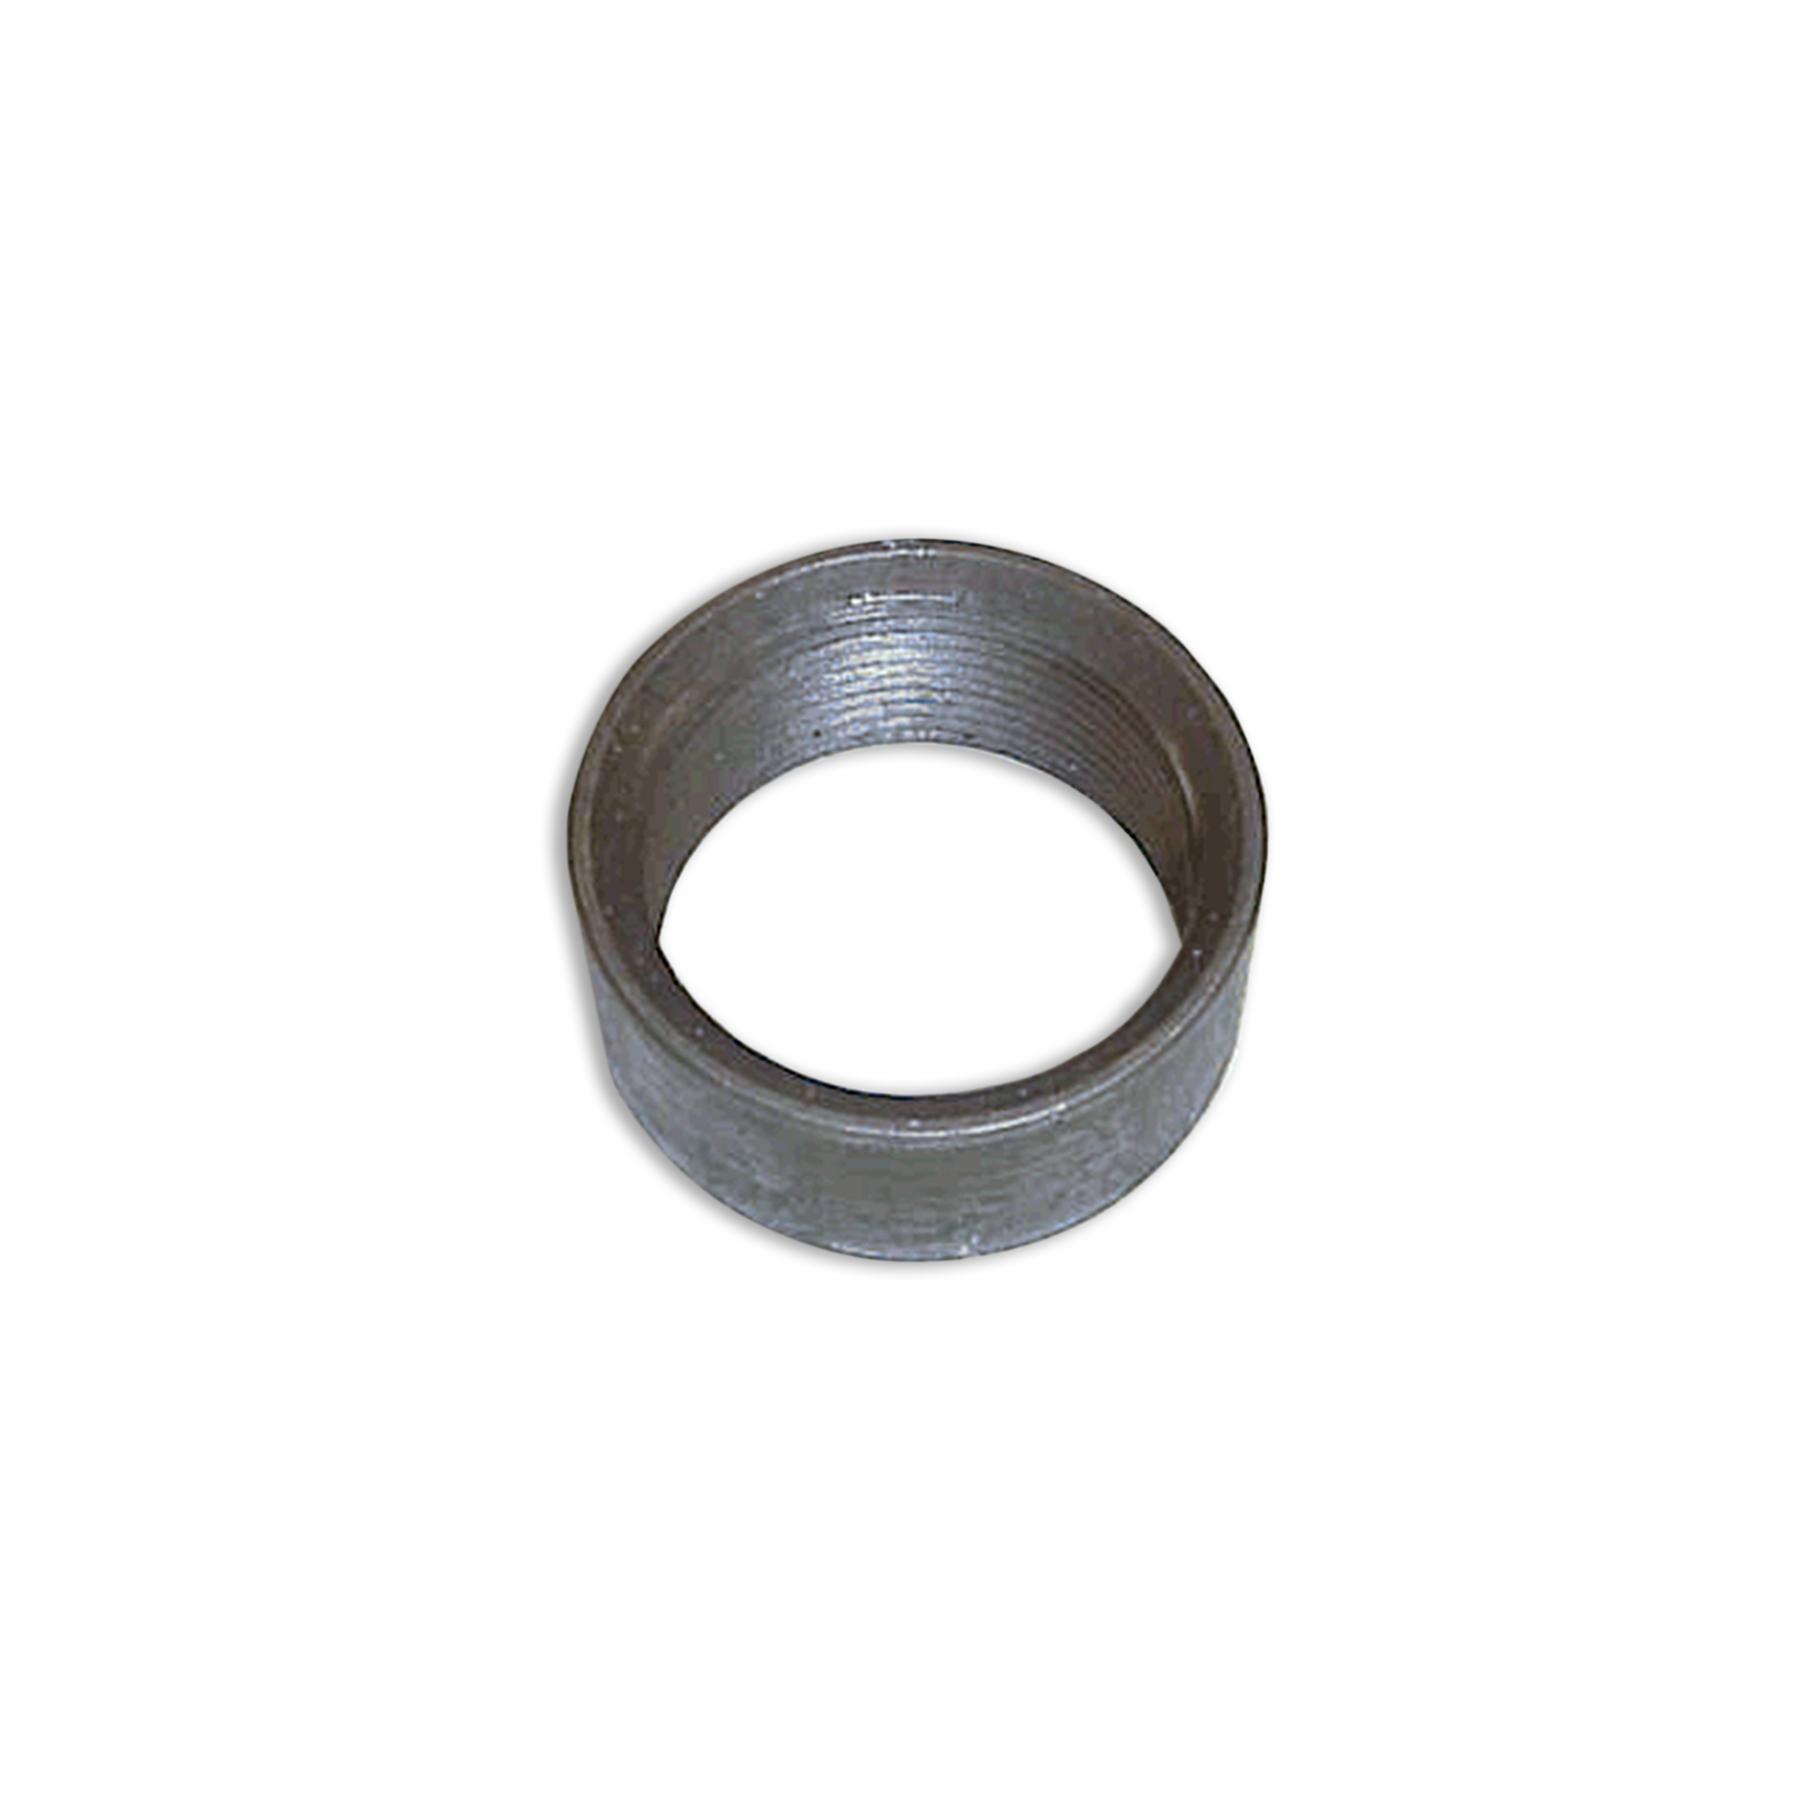 Steel Merchant Half Coupling Fitting, 1-1/2 (F) NPT